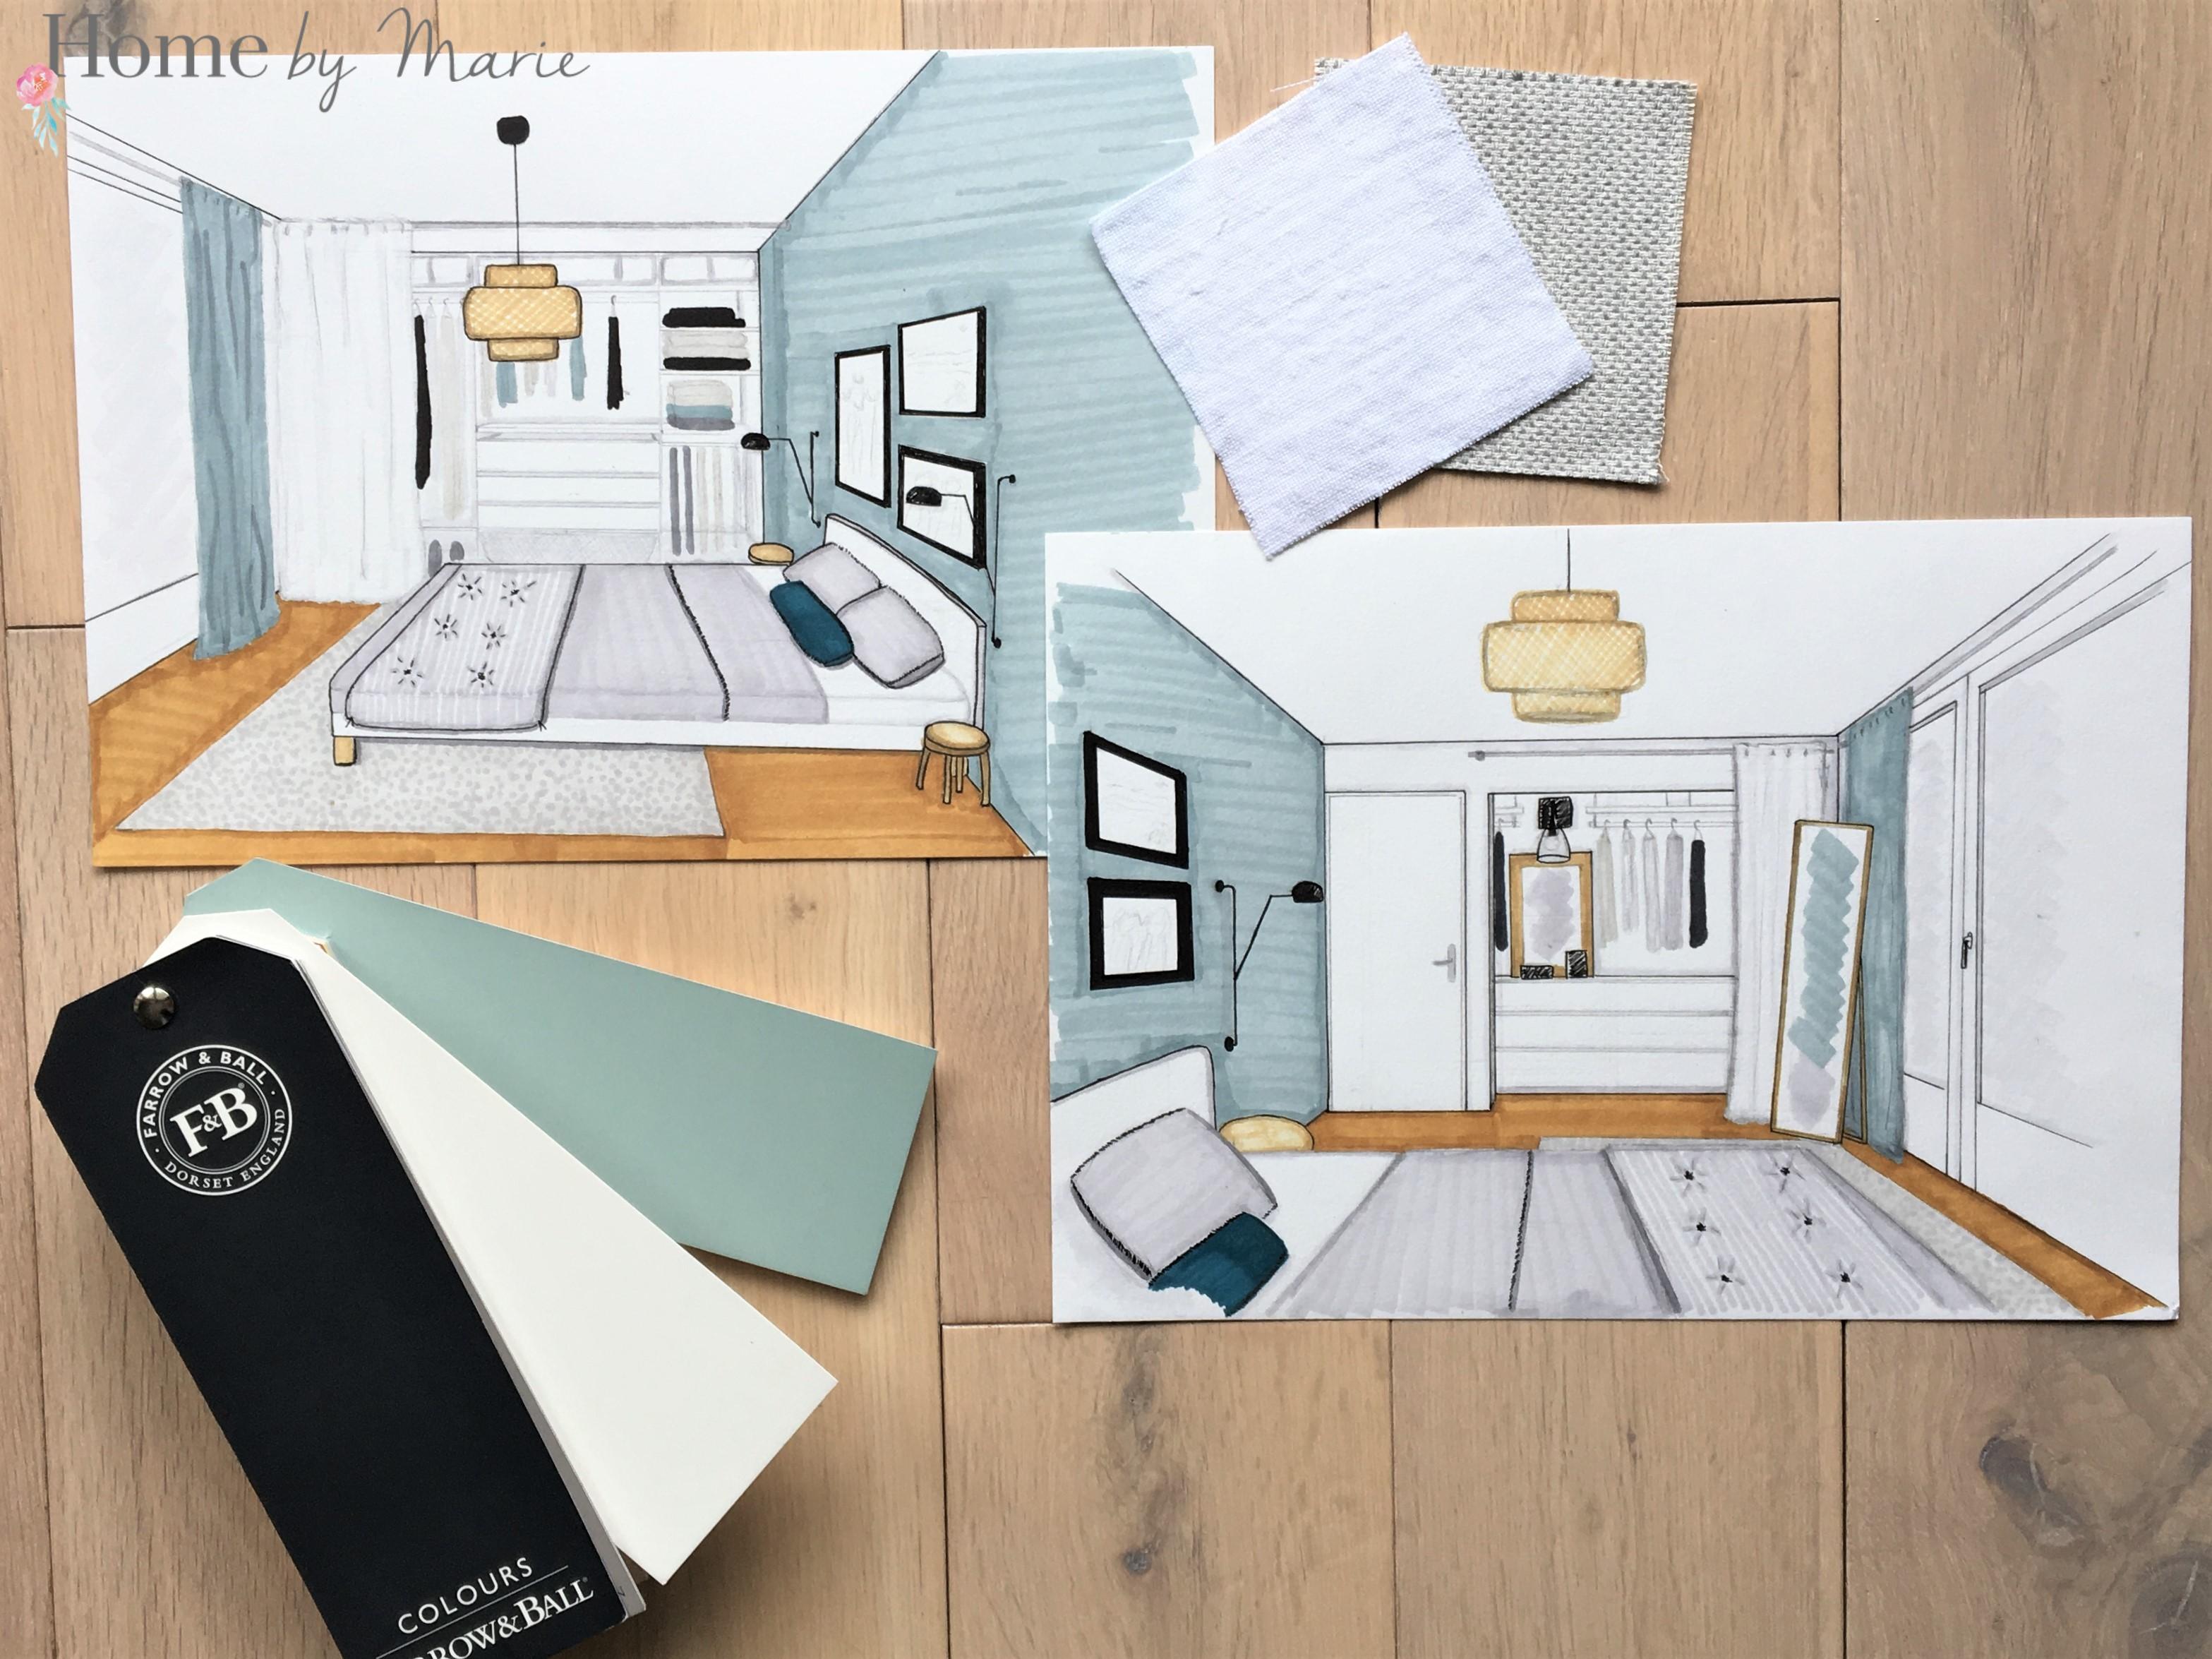 Une chambre parentale cosy et scandinave Home by Marie